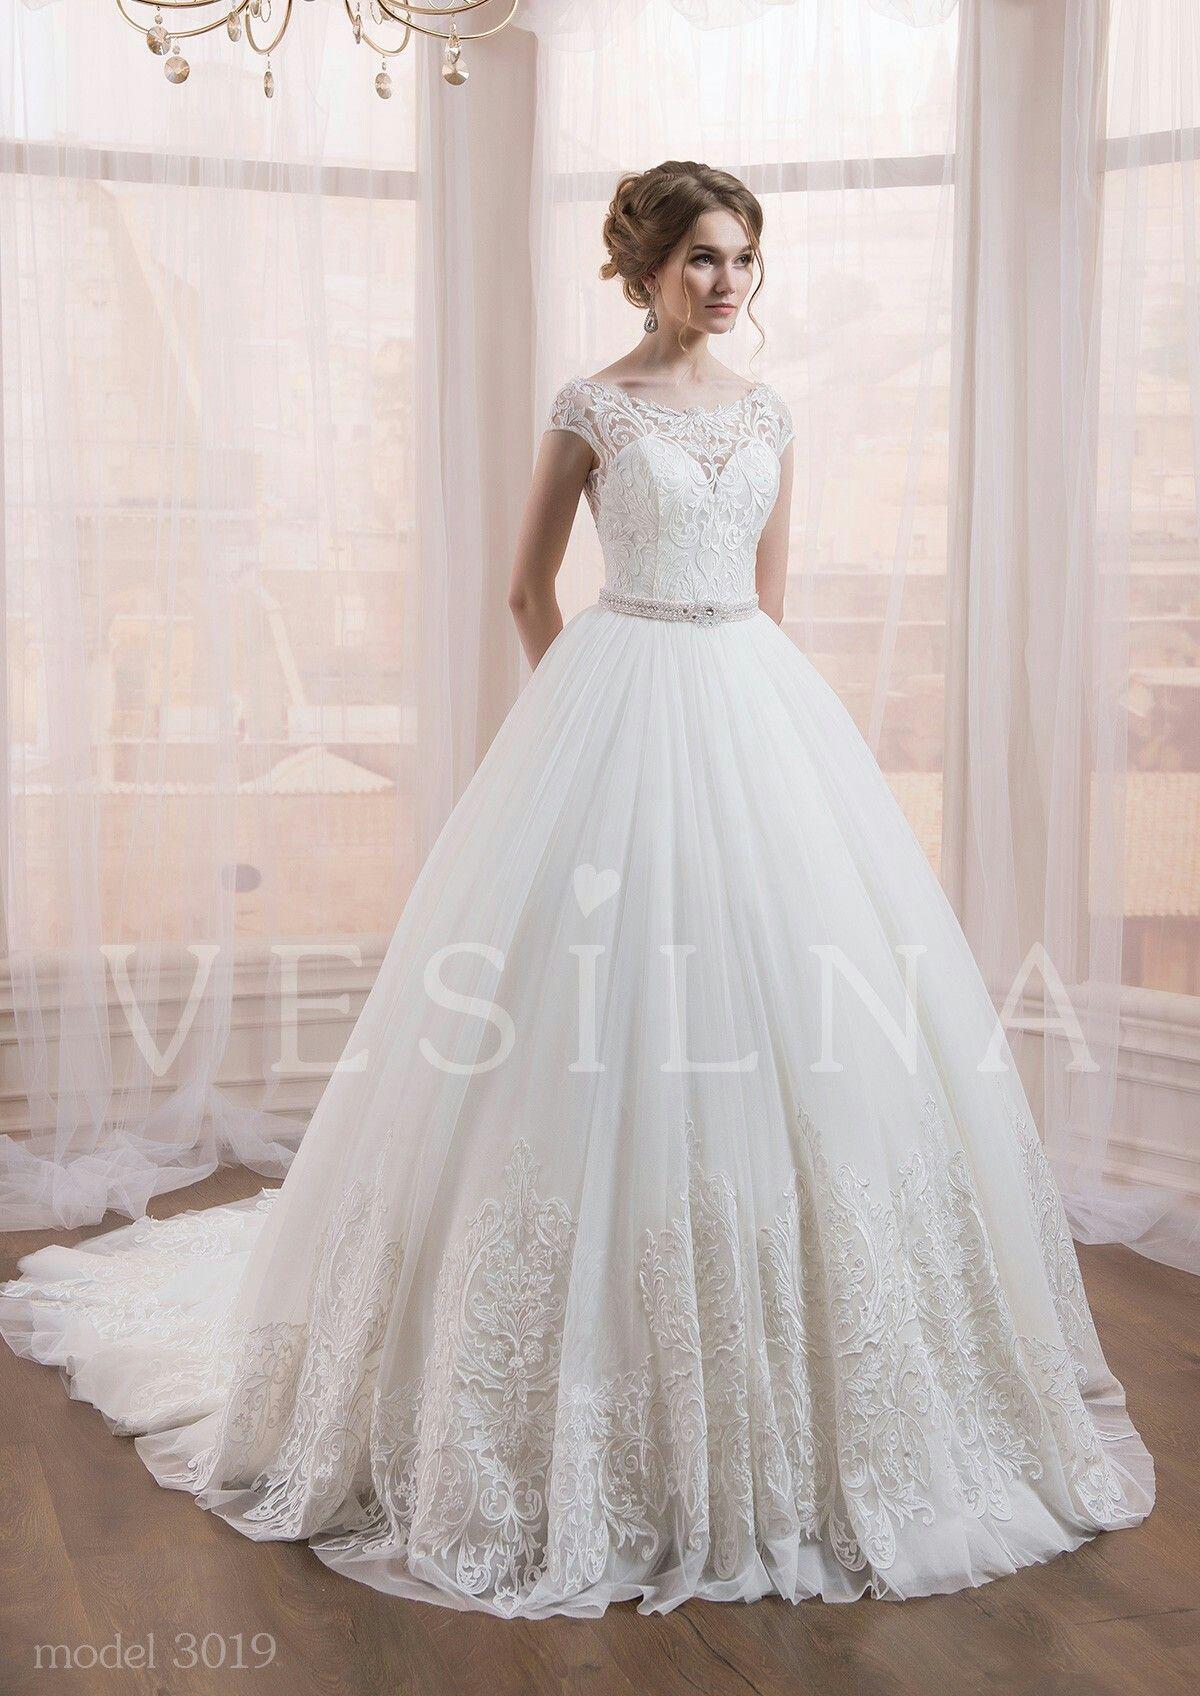 Pin by vanda desiree on wedding dresses pinterest wedding